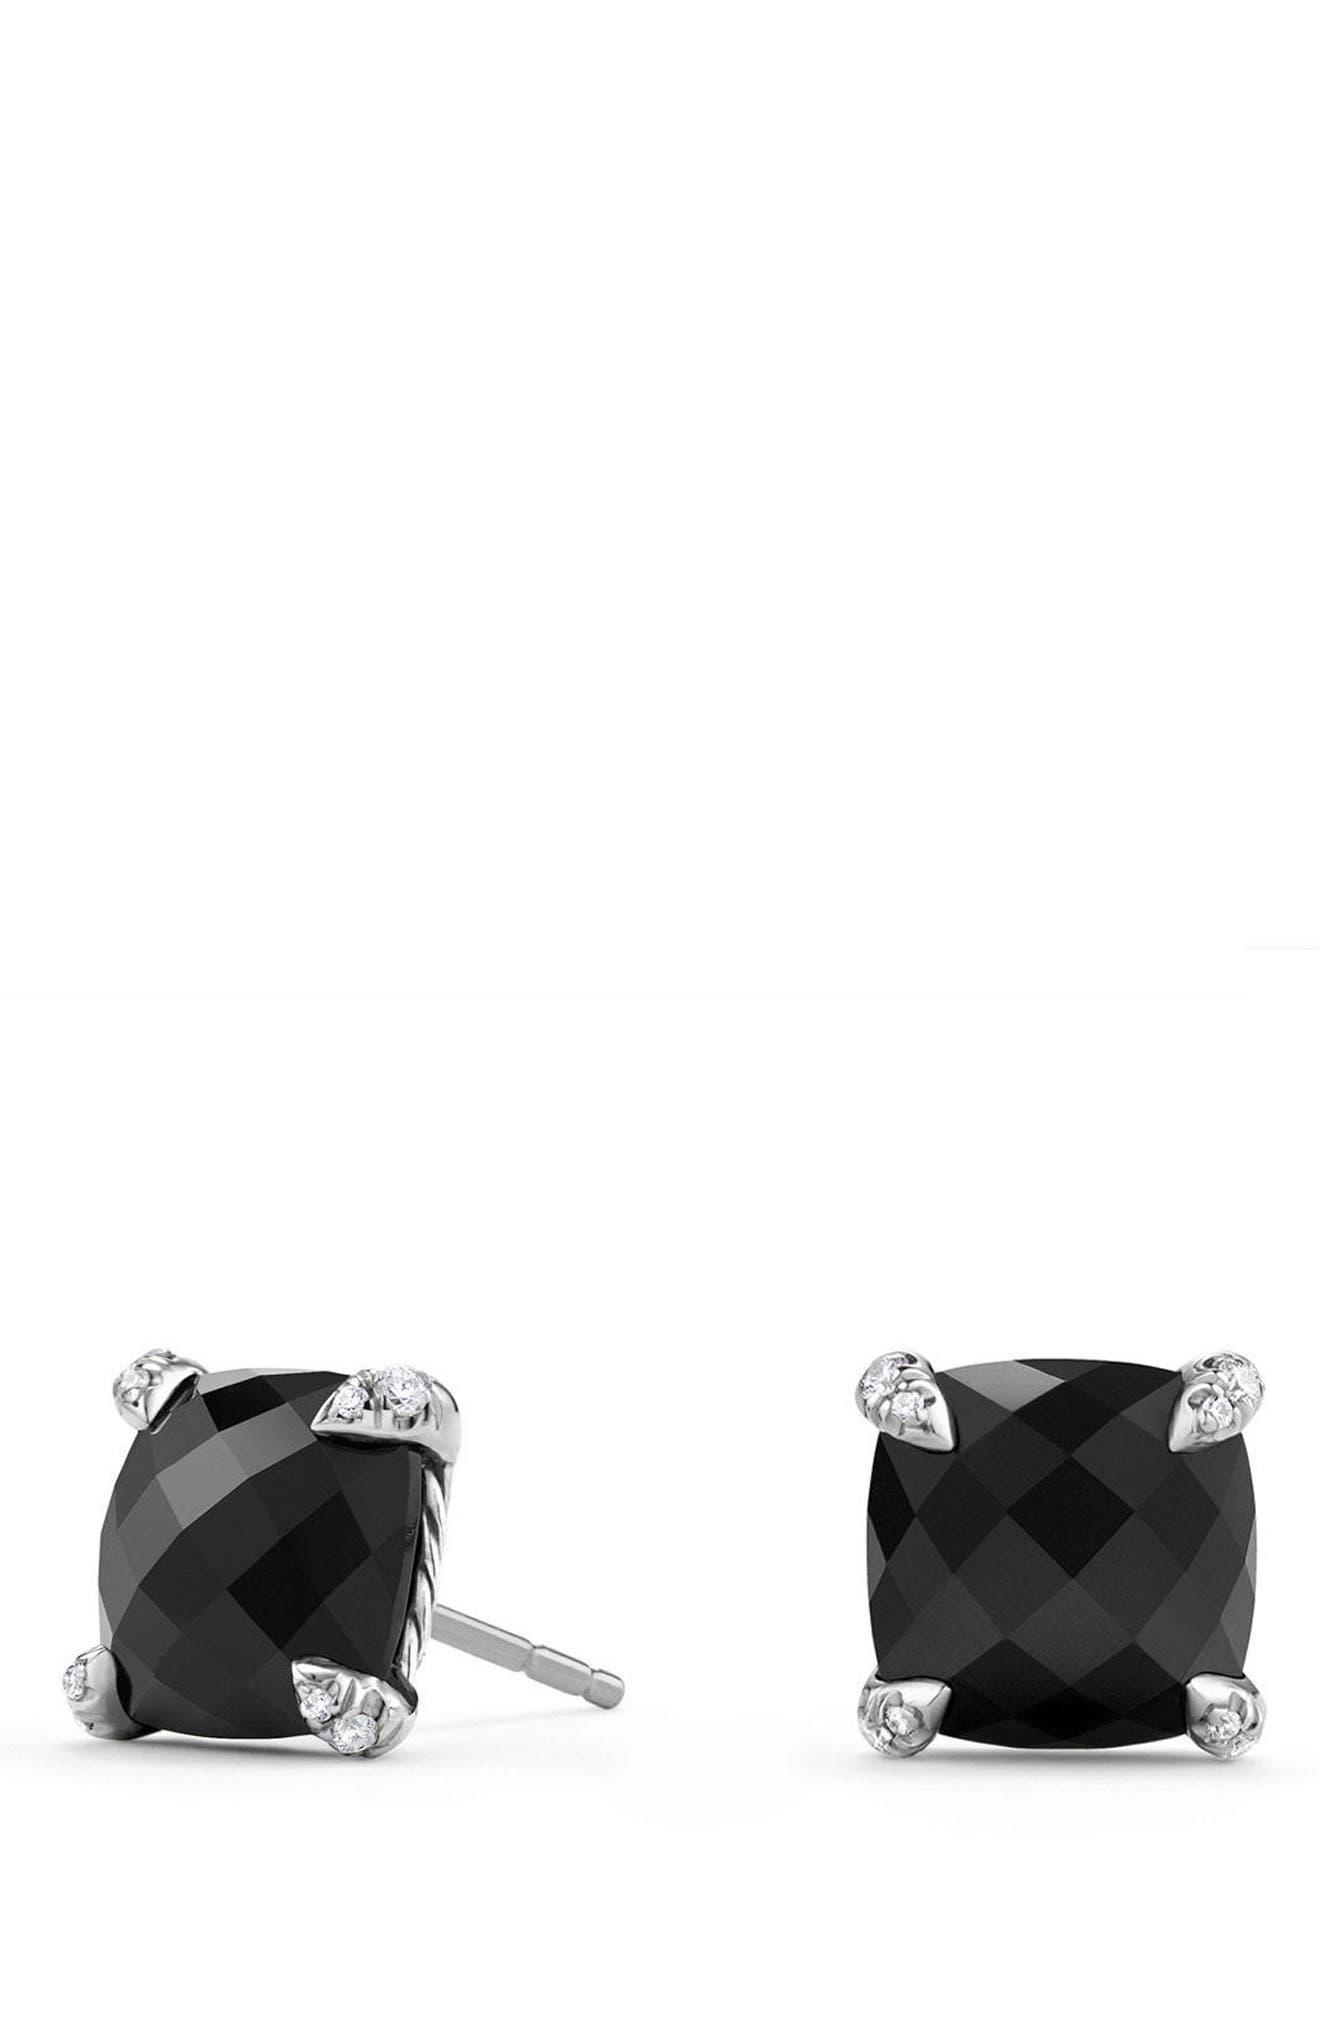 Châtelaine Earrings with Diamonds,                         Main,                         color, Black Onyx